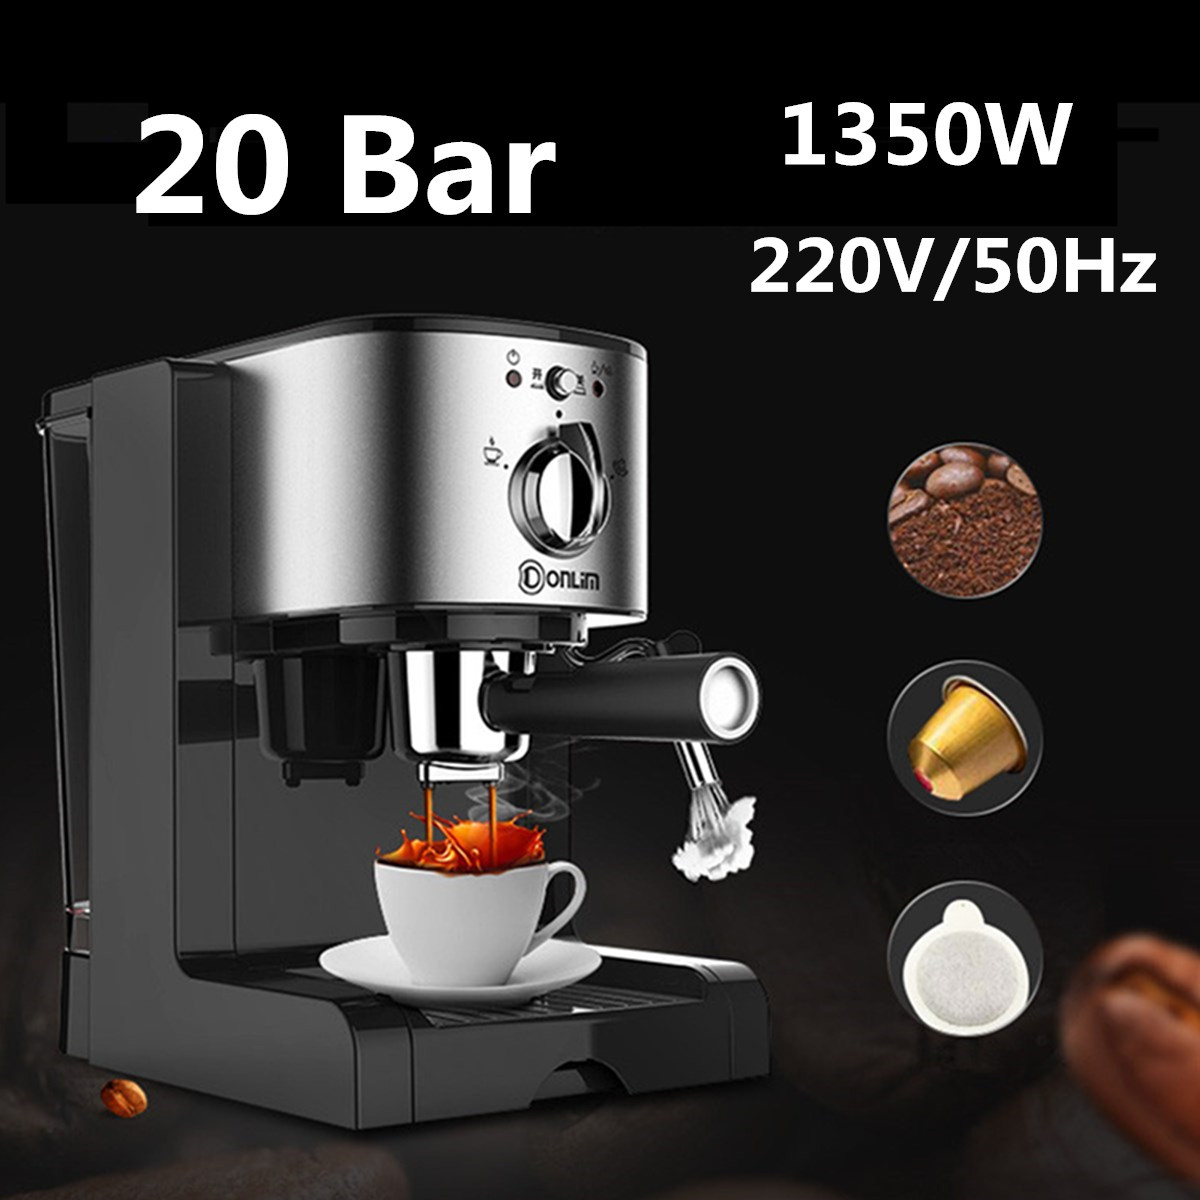 DL-KF500 Semi Automatic Coffee Maker 3In1 Cafe Maker Machine Kitchen 1.5L  Barista Espresso Machine Milk SteamerDL-KF500 Semi Automatic Coffee Maker 3In1 Cafe Maker Machine Kitchen 1.5L  Barista Espresso Machine Milk Steamer